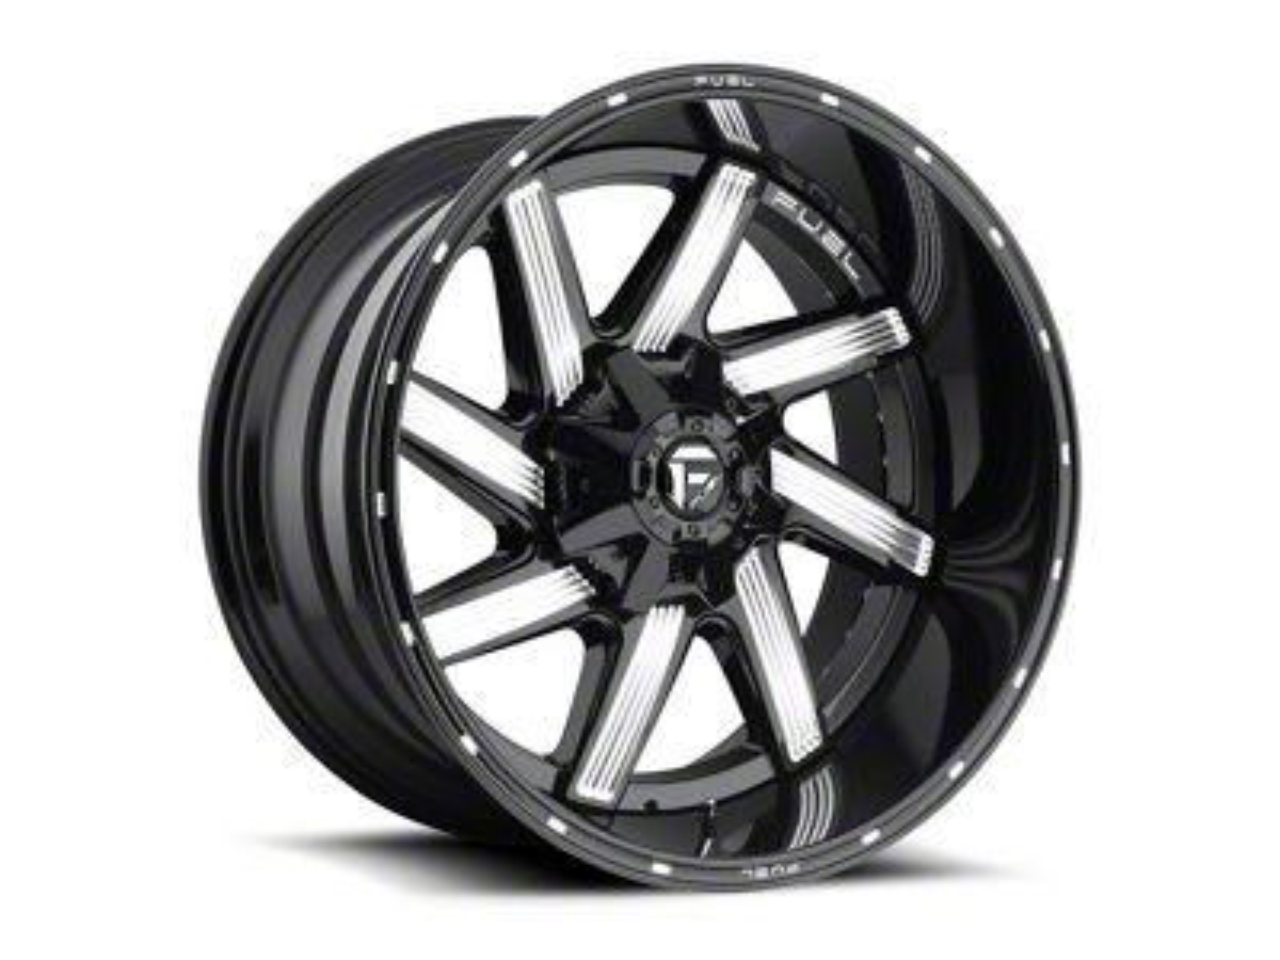 Fuel Wheels Moab Gloss Black Milled 5-Lug Wheel - 20x12 (02-18 RAM 1500, Excluding Mega Cab)